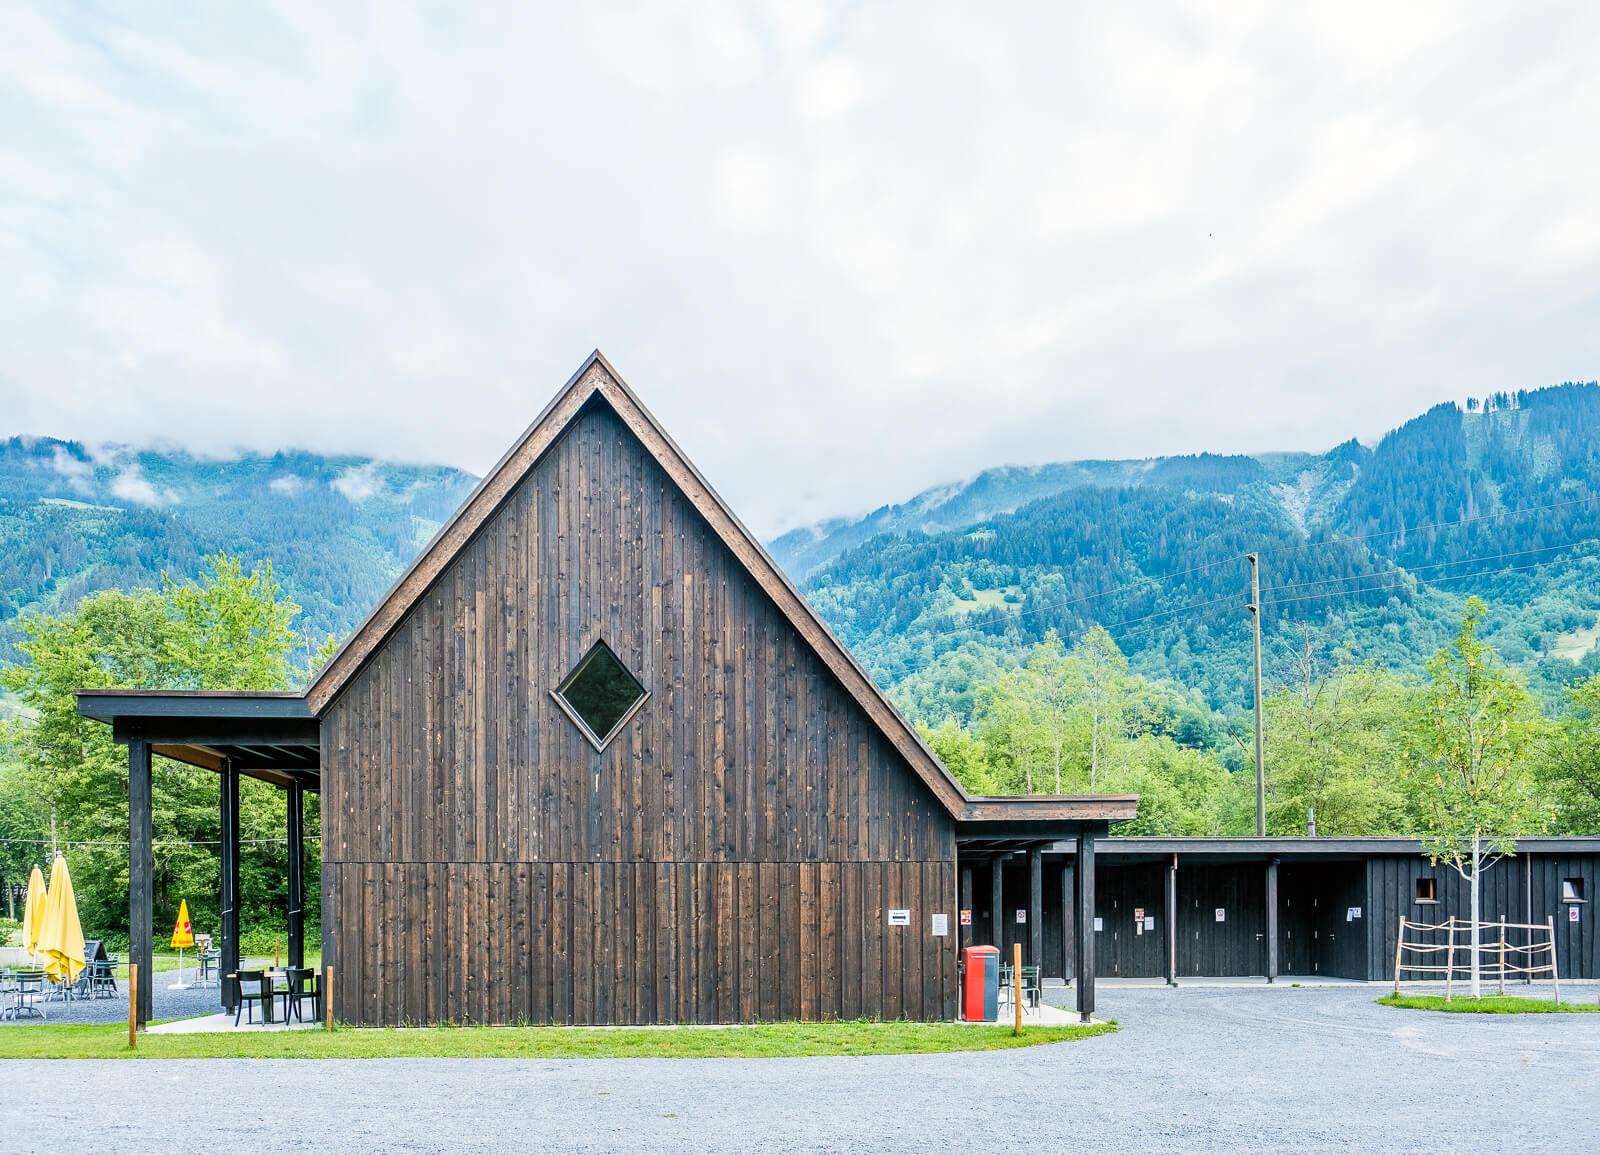 Ustria Ogna in Trun, Switzerland